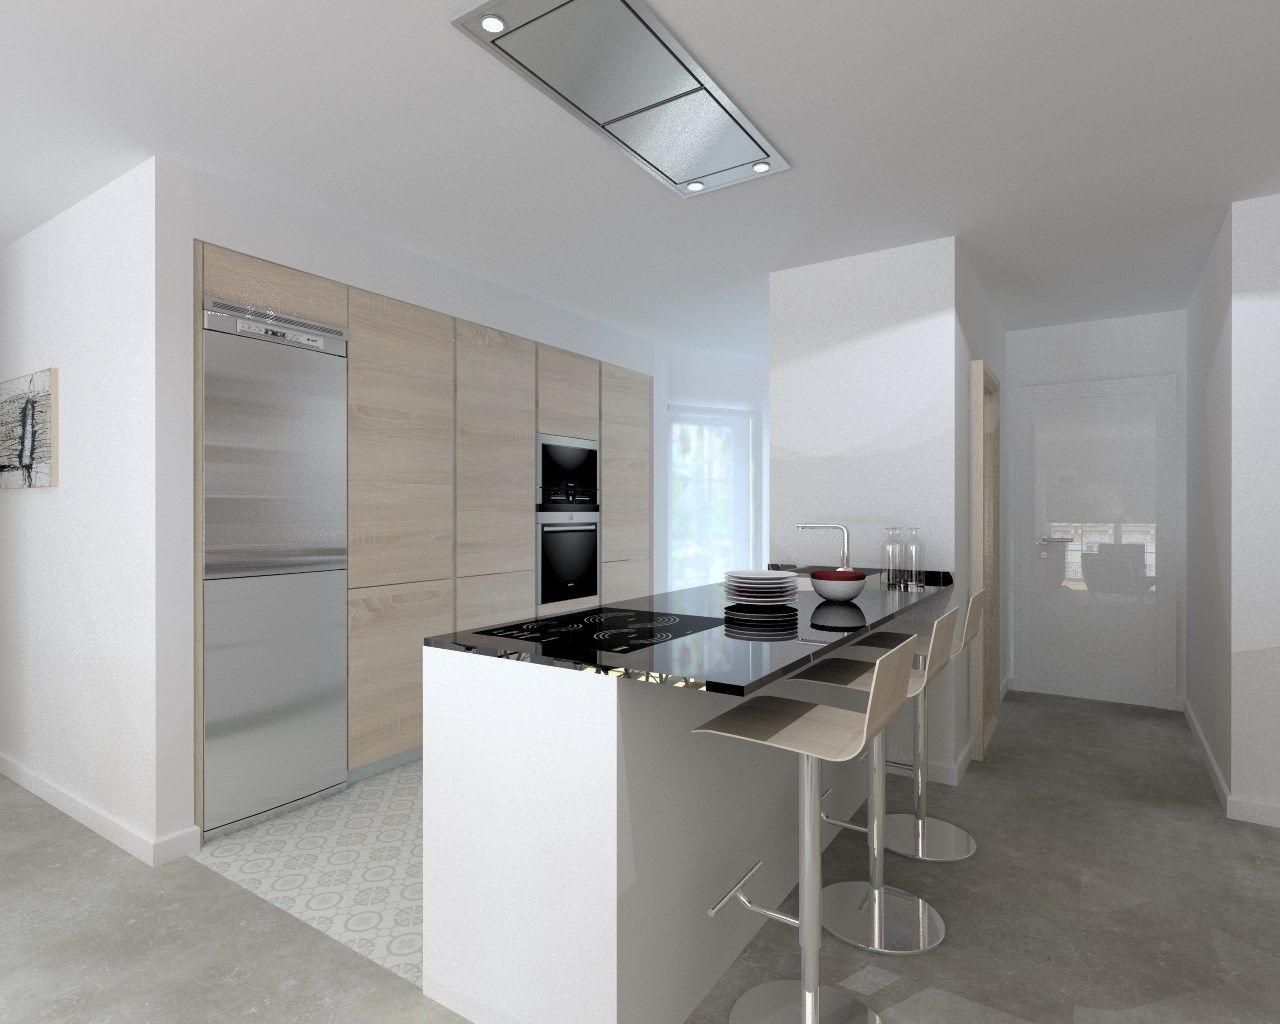 Cocina santos modelo line estratificado blanco roble encimera granito negro a comer kitchen - Encimera granito negro ...